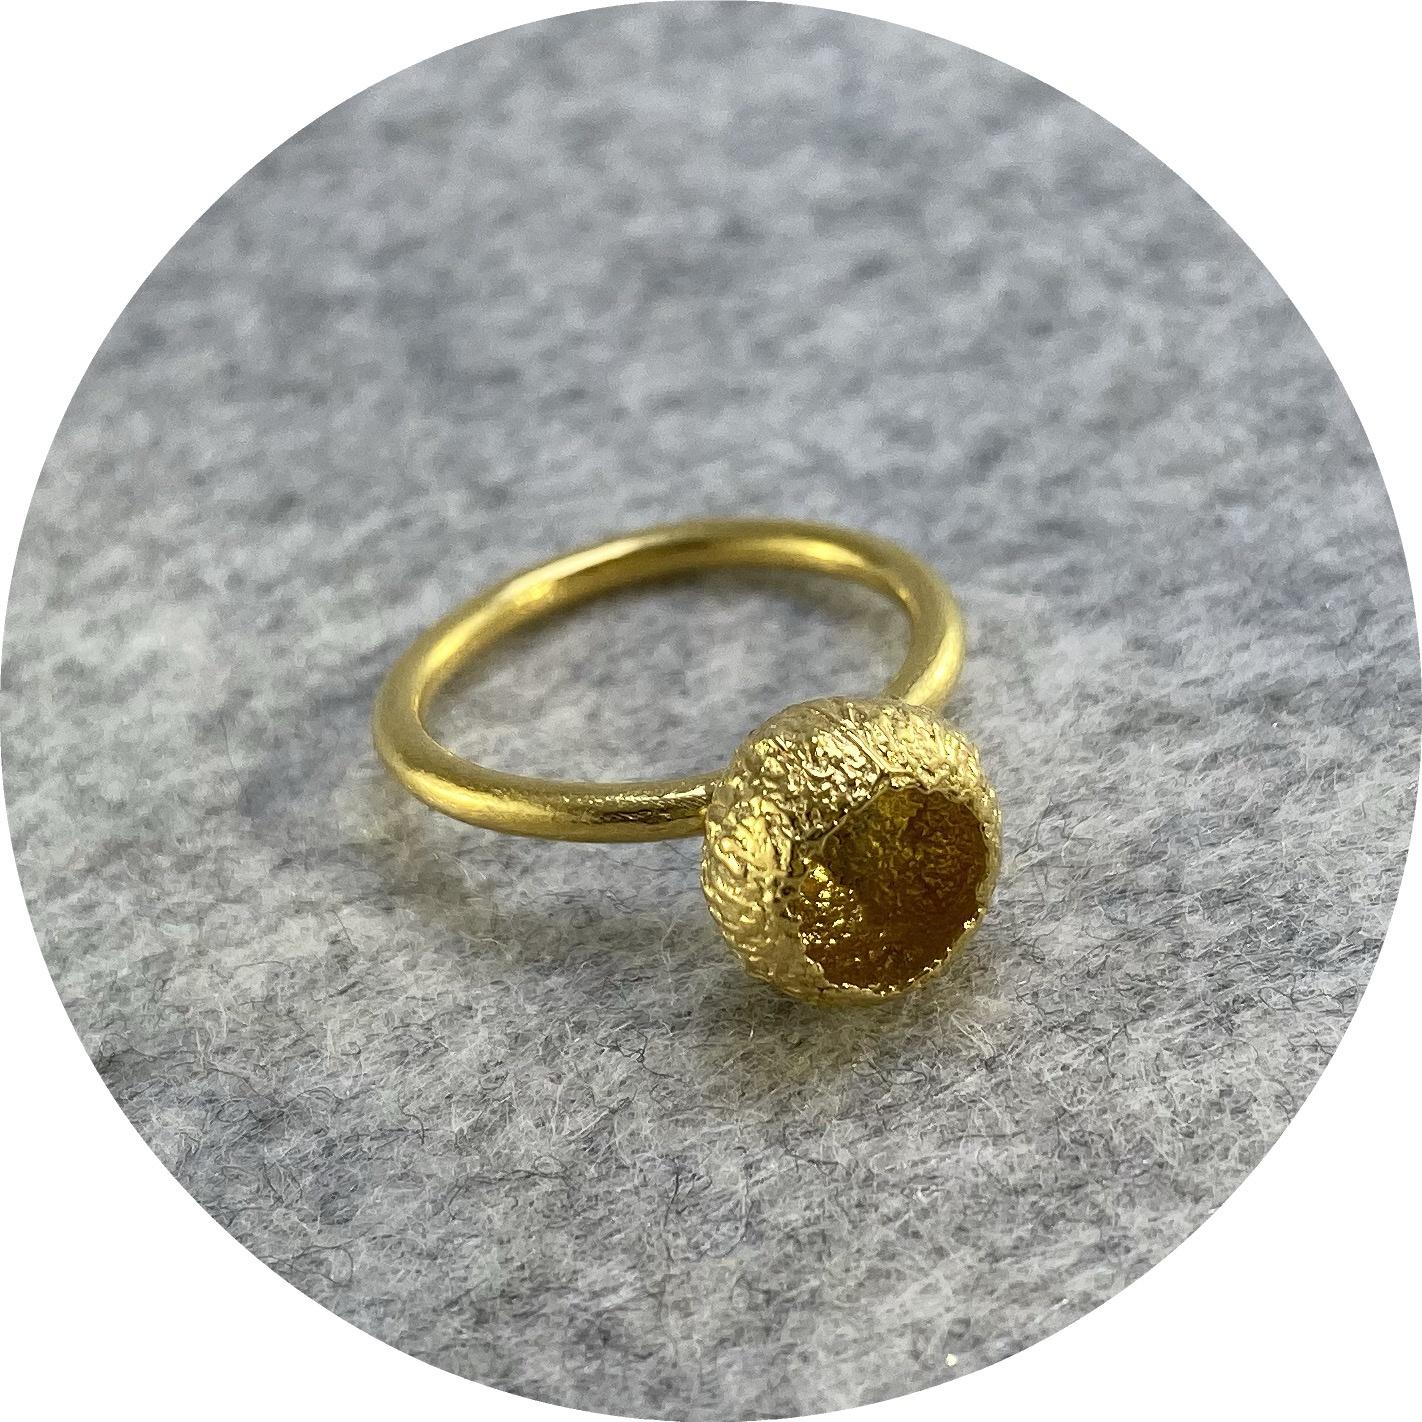 Manuela Igreja- Acorn cap ring. Gold plated sterling silver. size J.